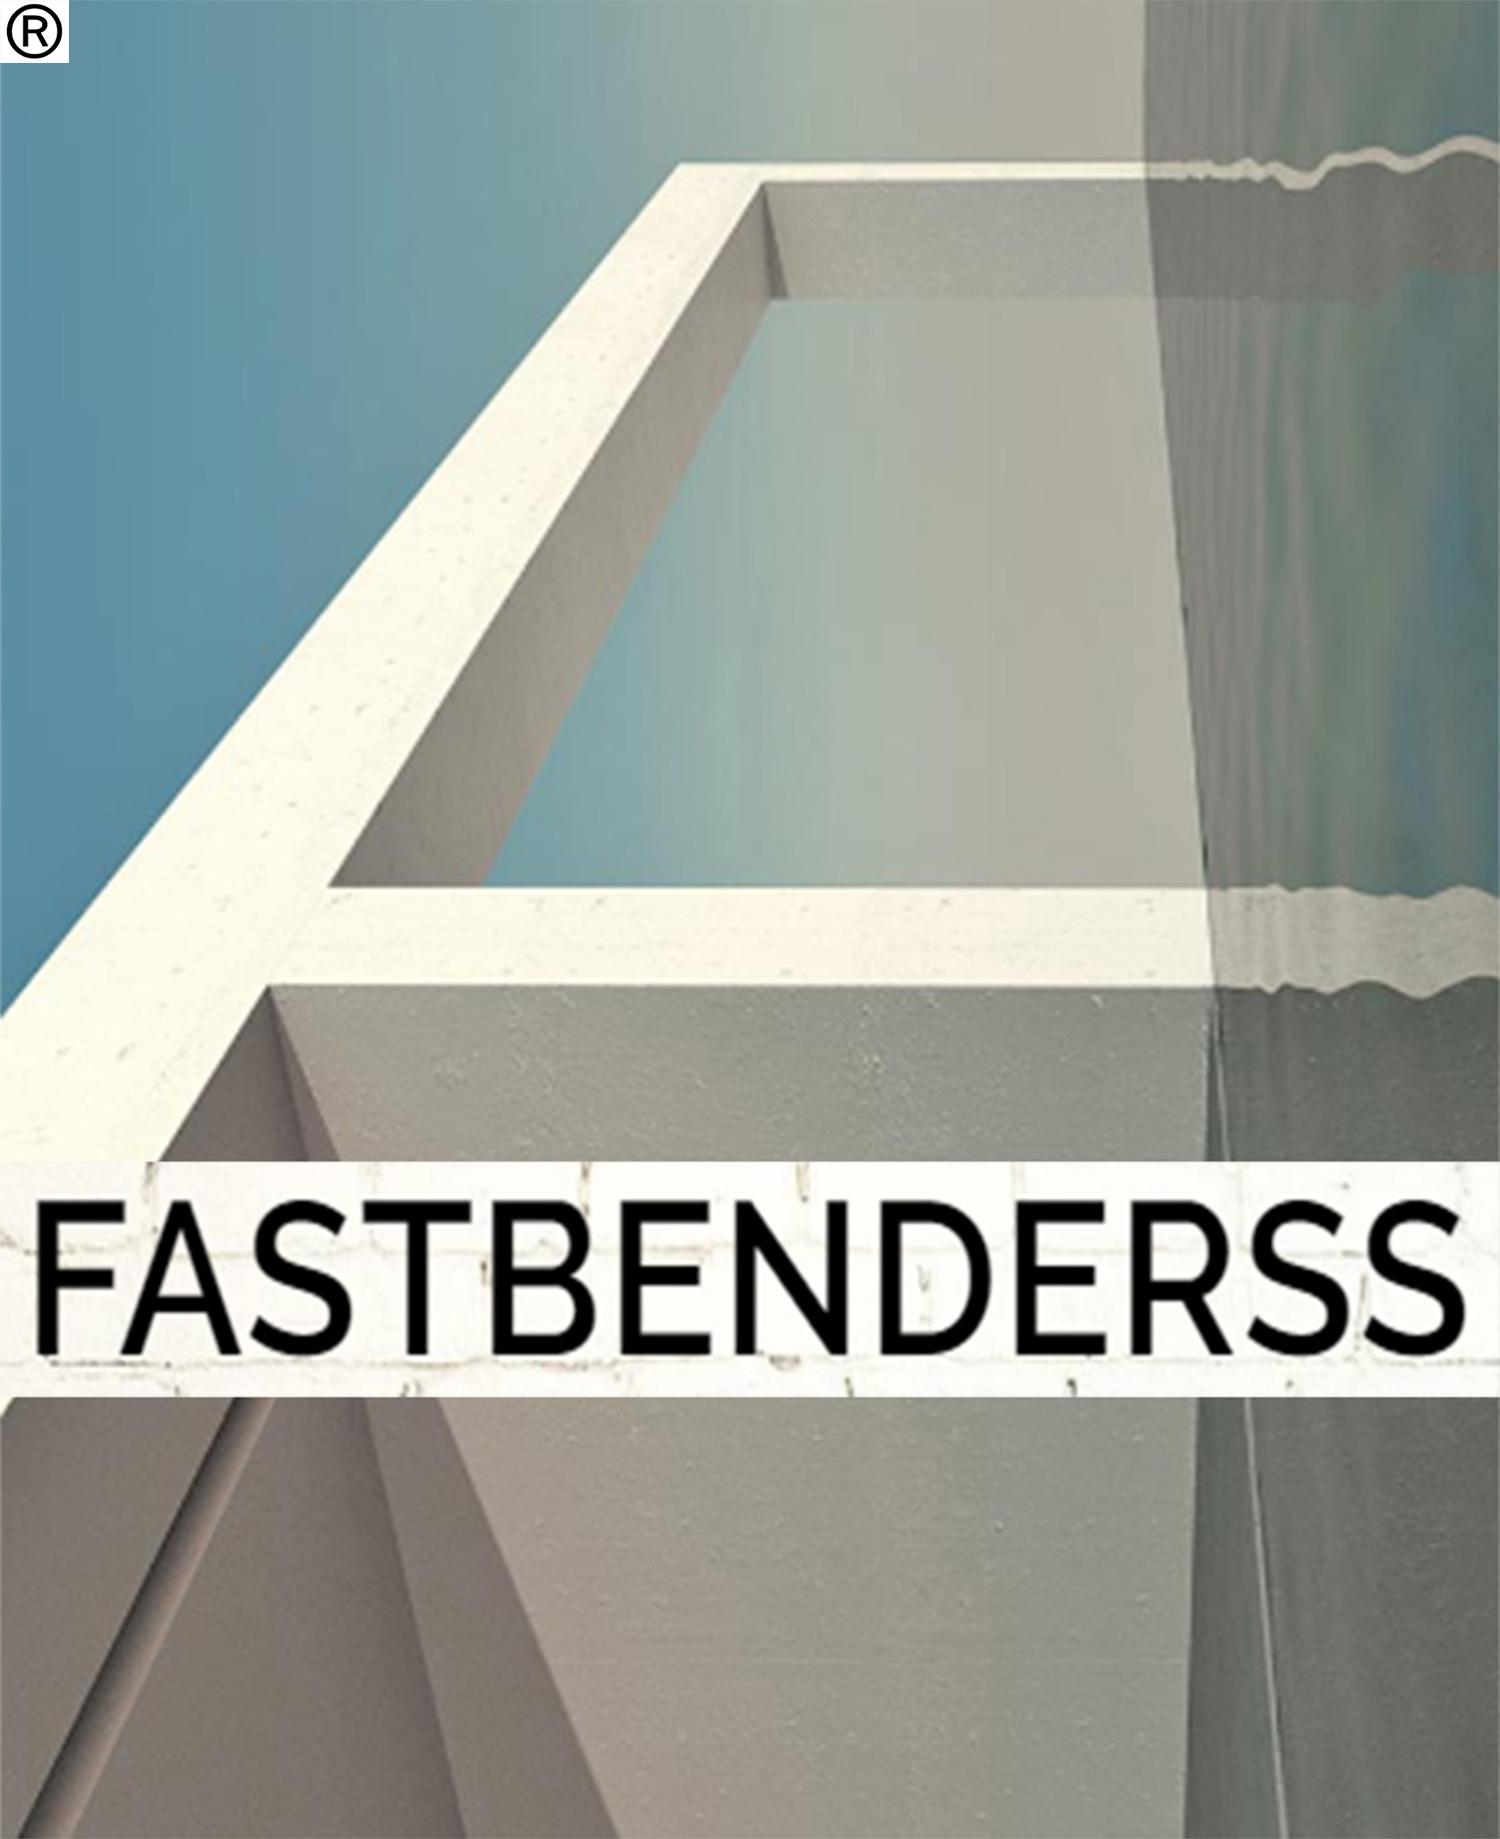 Fastbenderss